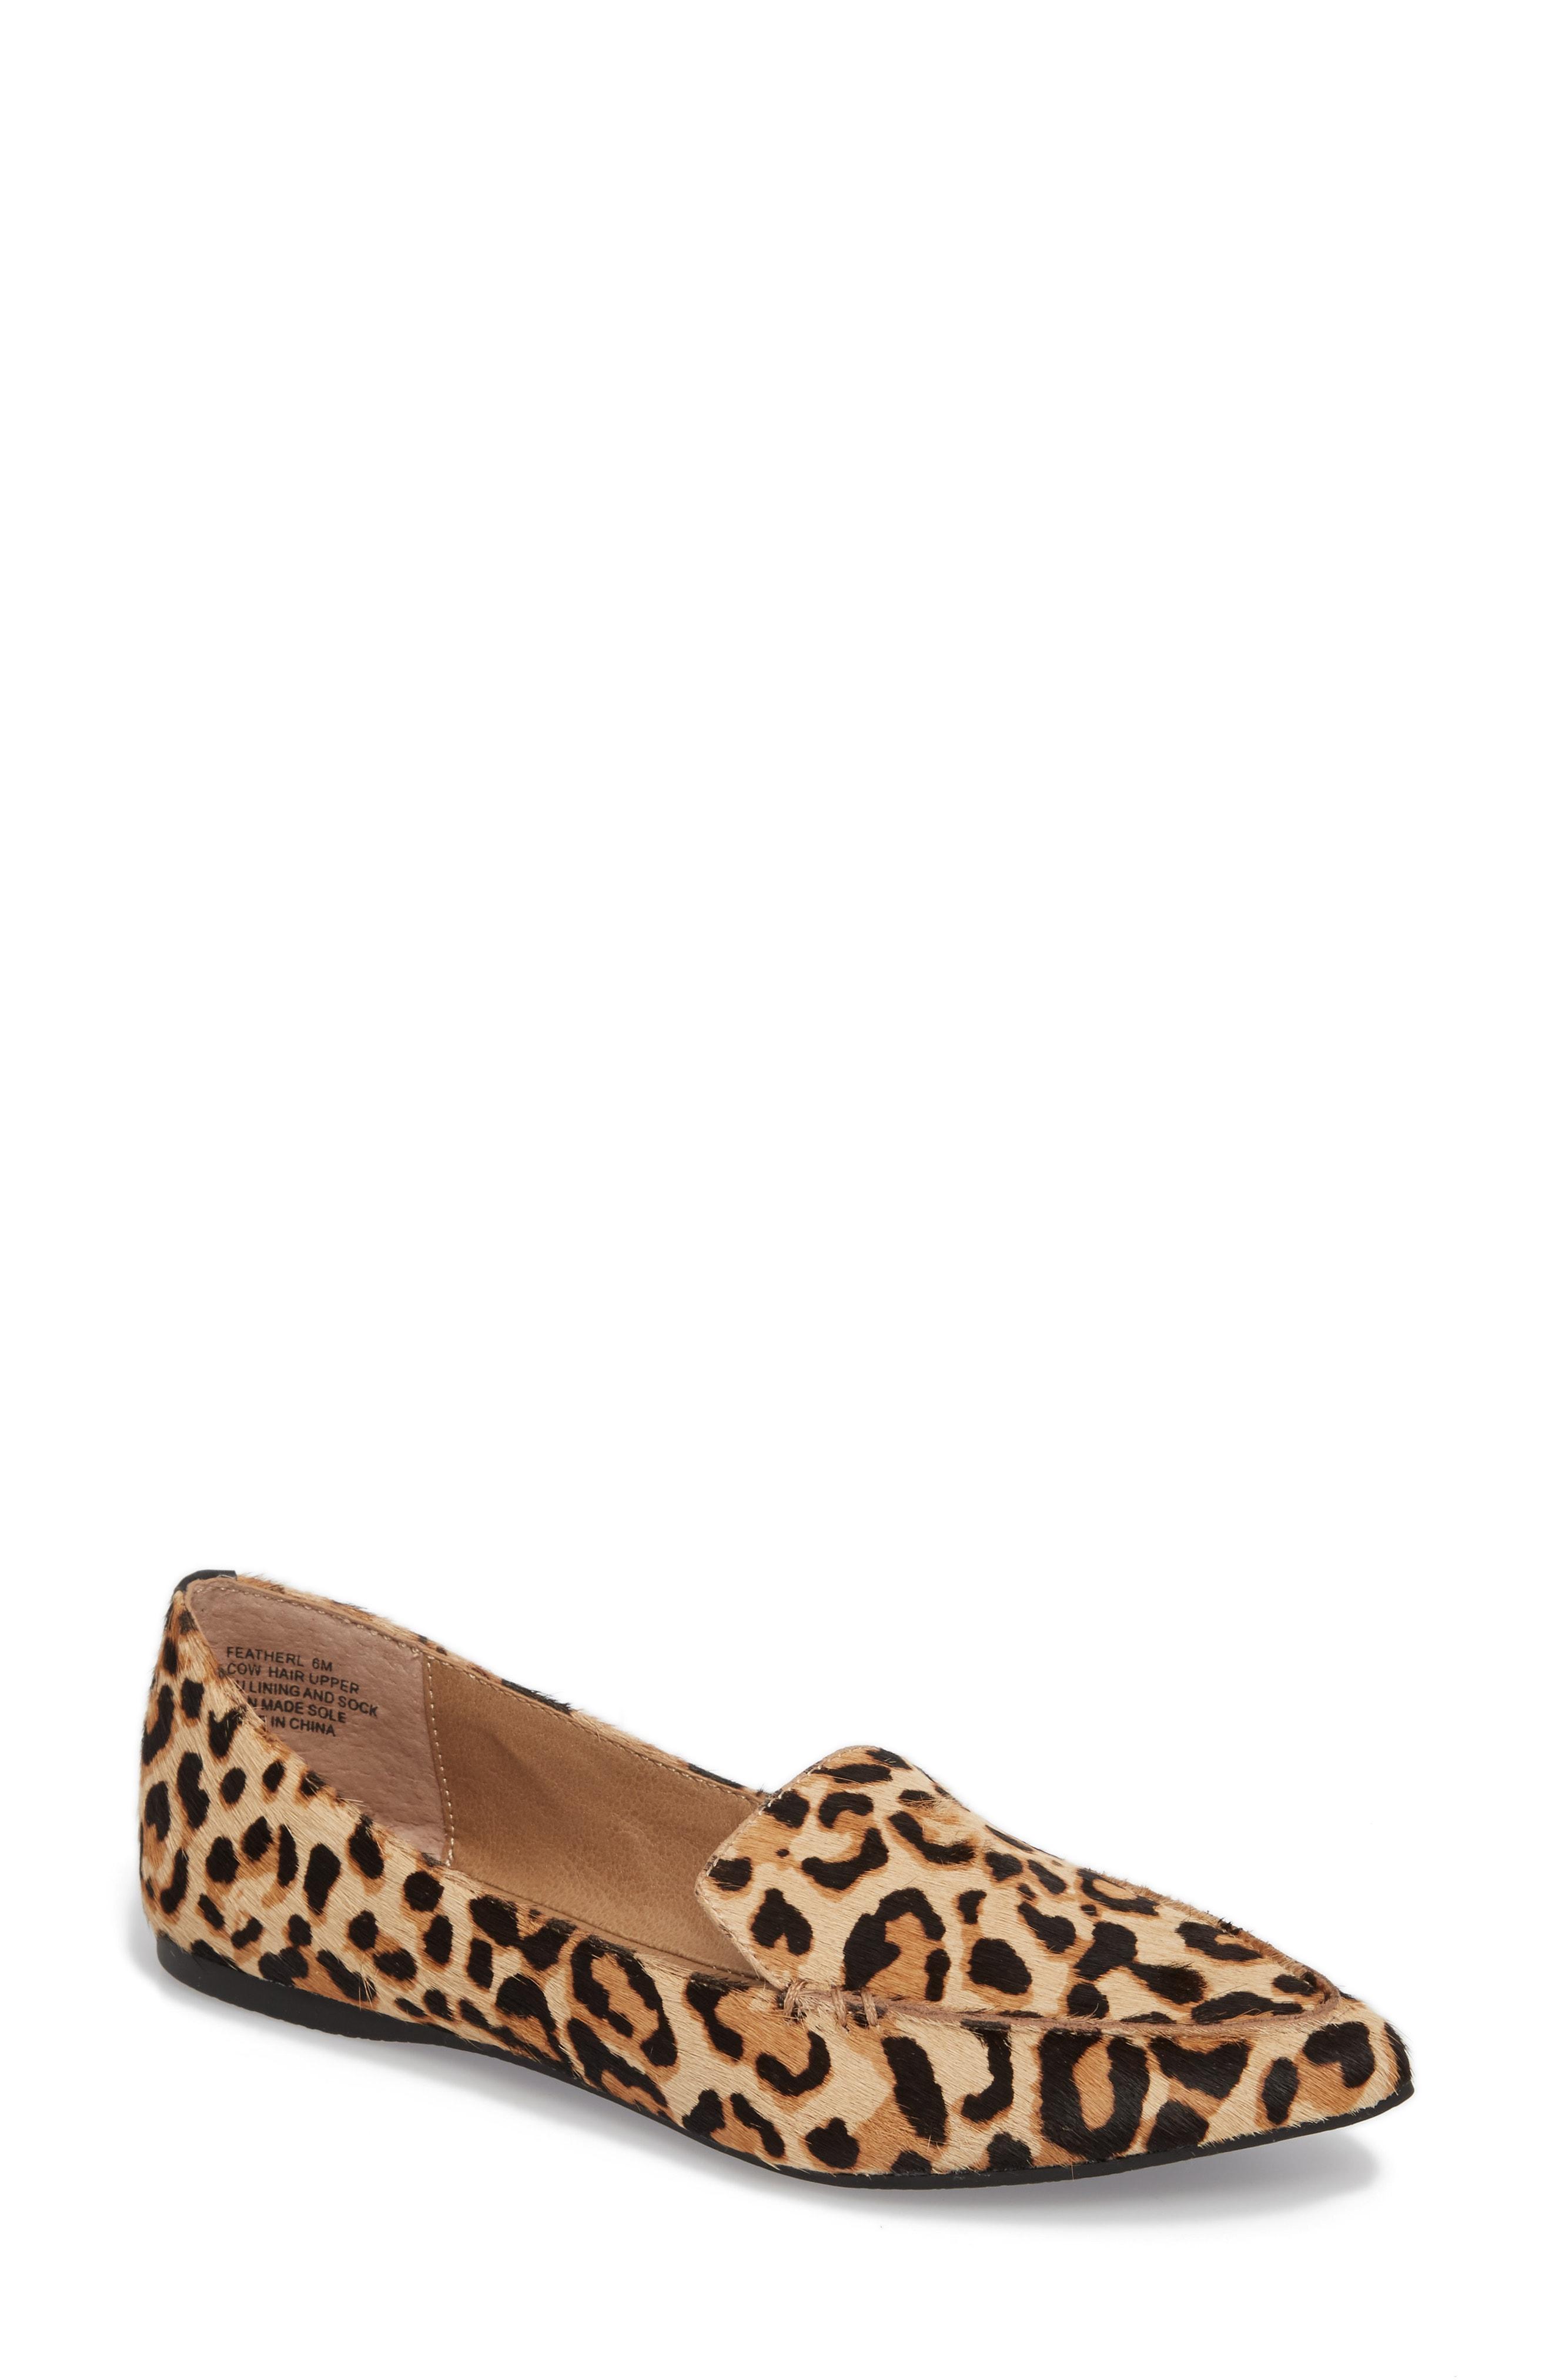 Steve Madden Feather-L Genuine Calf Hair Loafer Flat (Women)